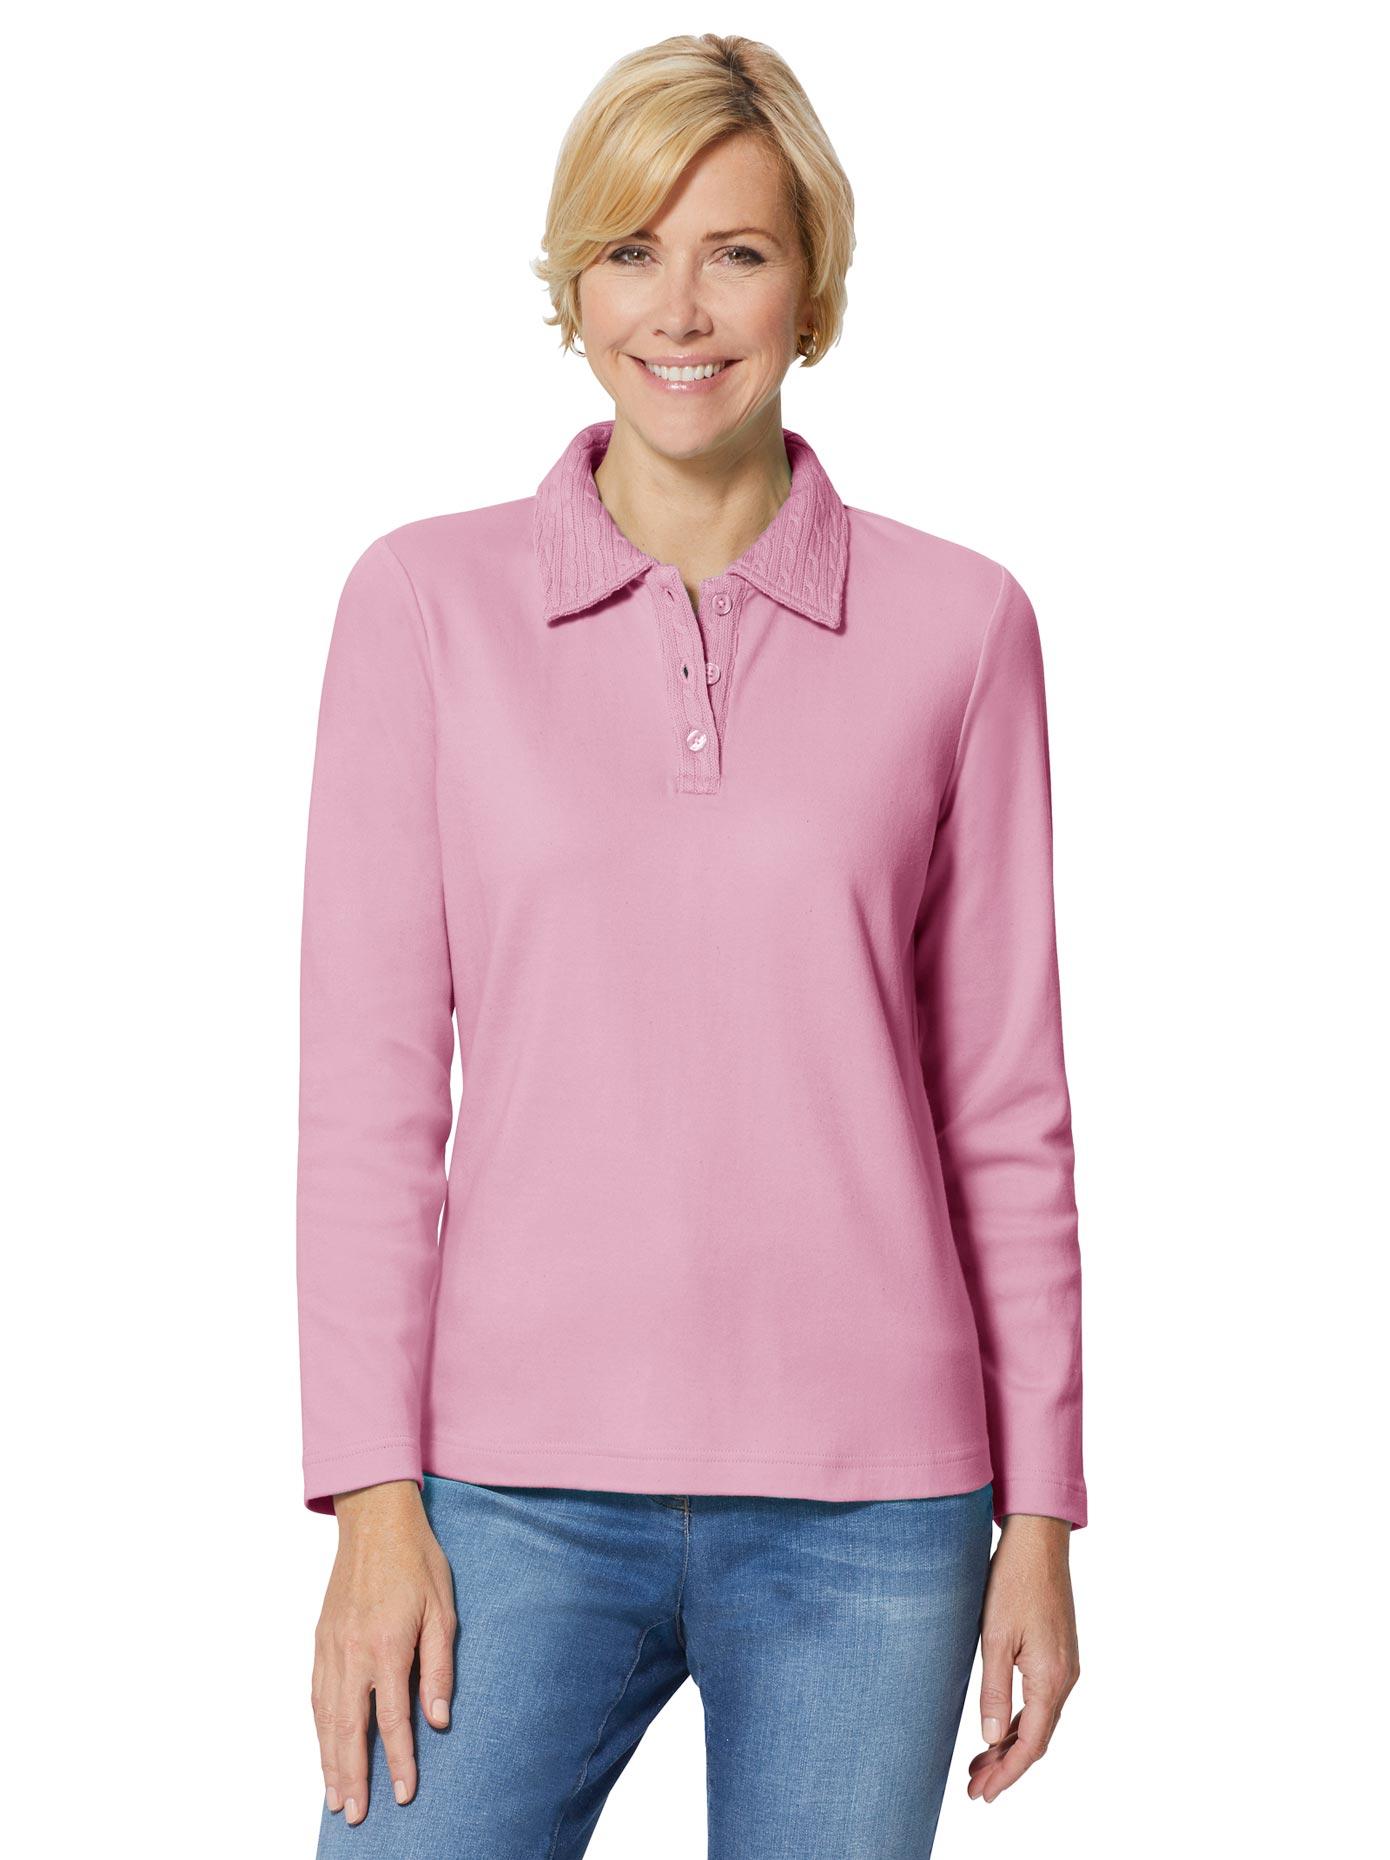 classic basics -  Winter-Shirt mit Zopf-Muster